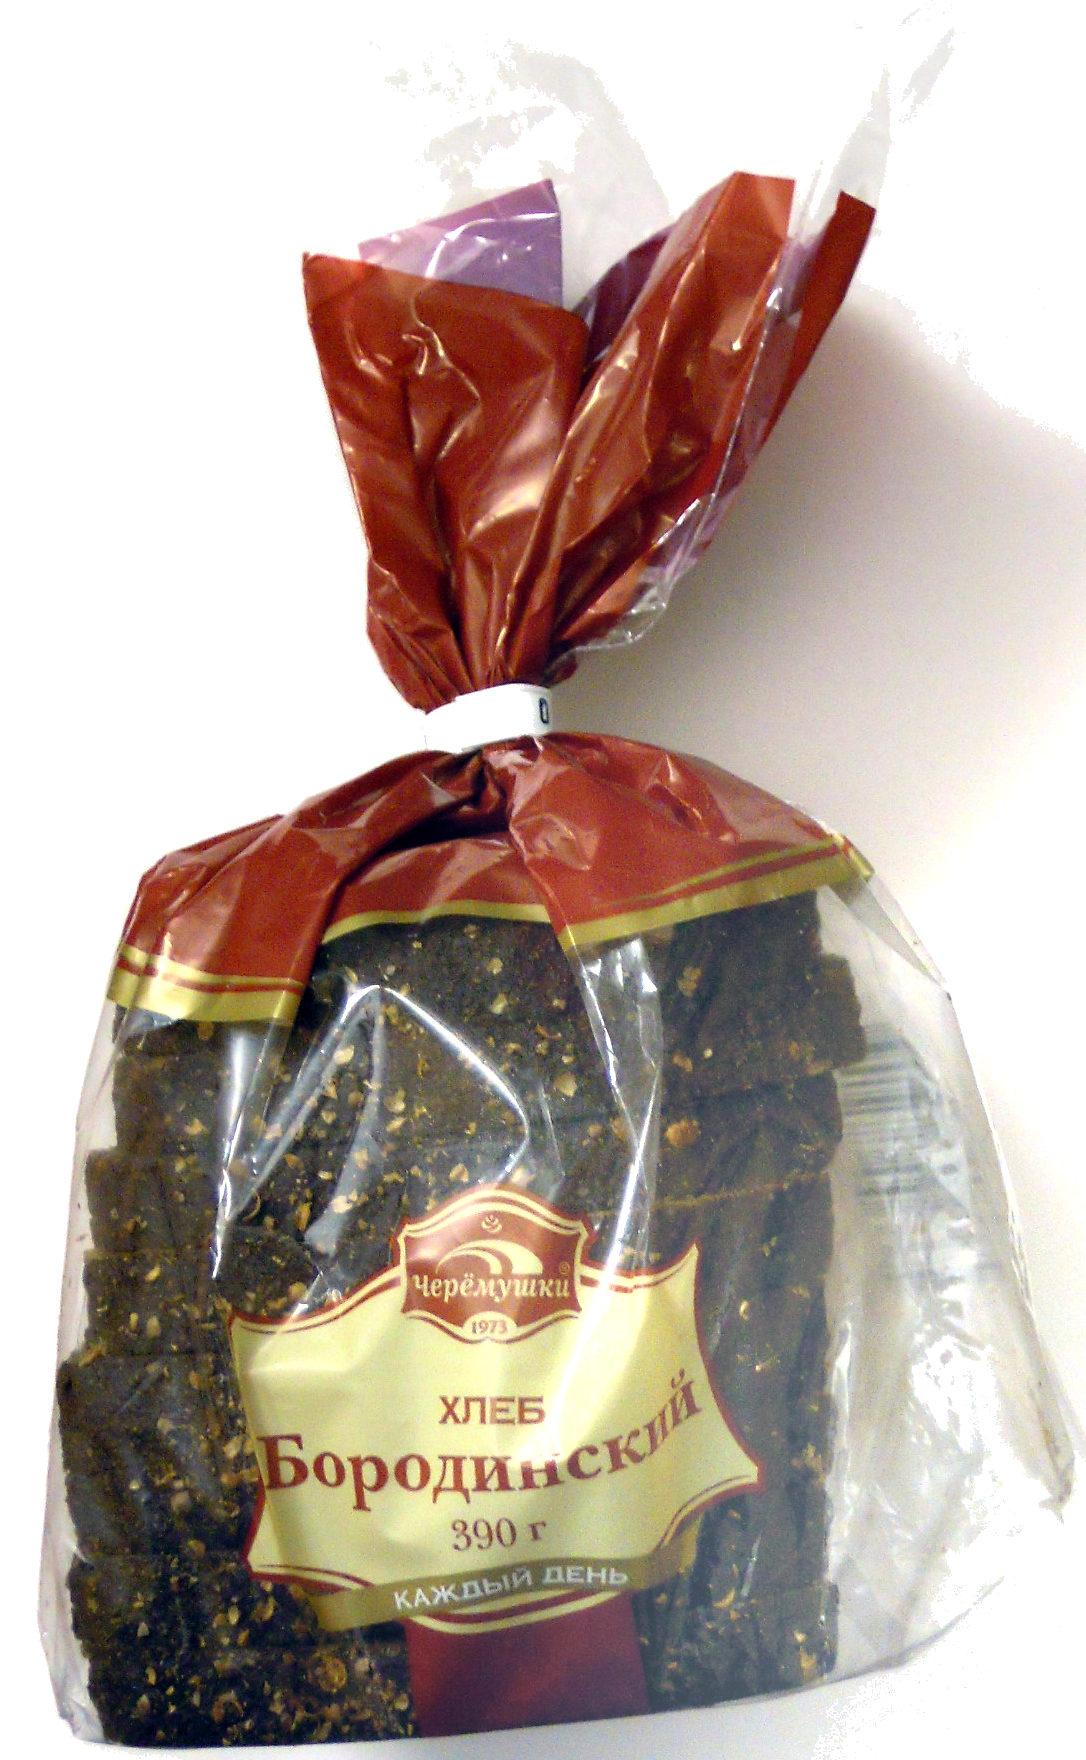 Хлеб Бородинский - Product